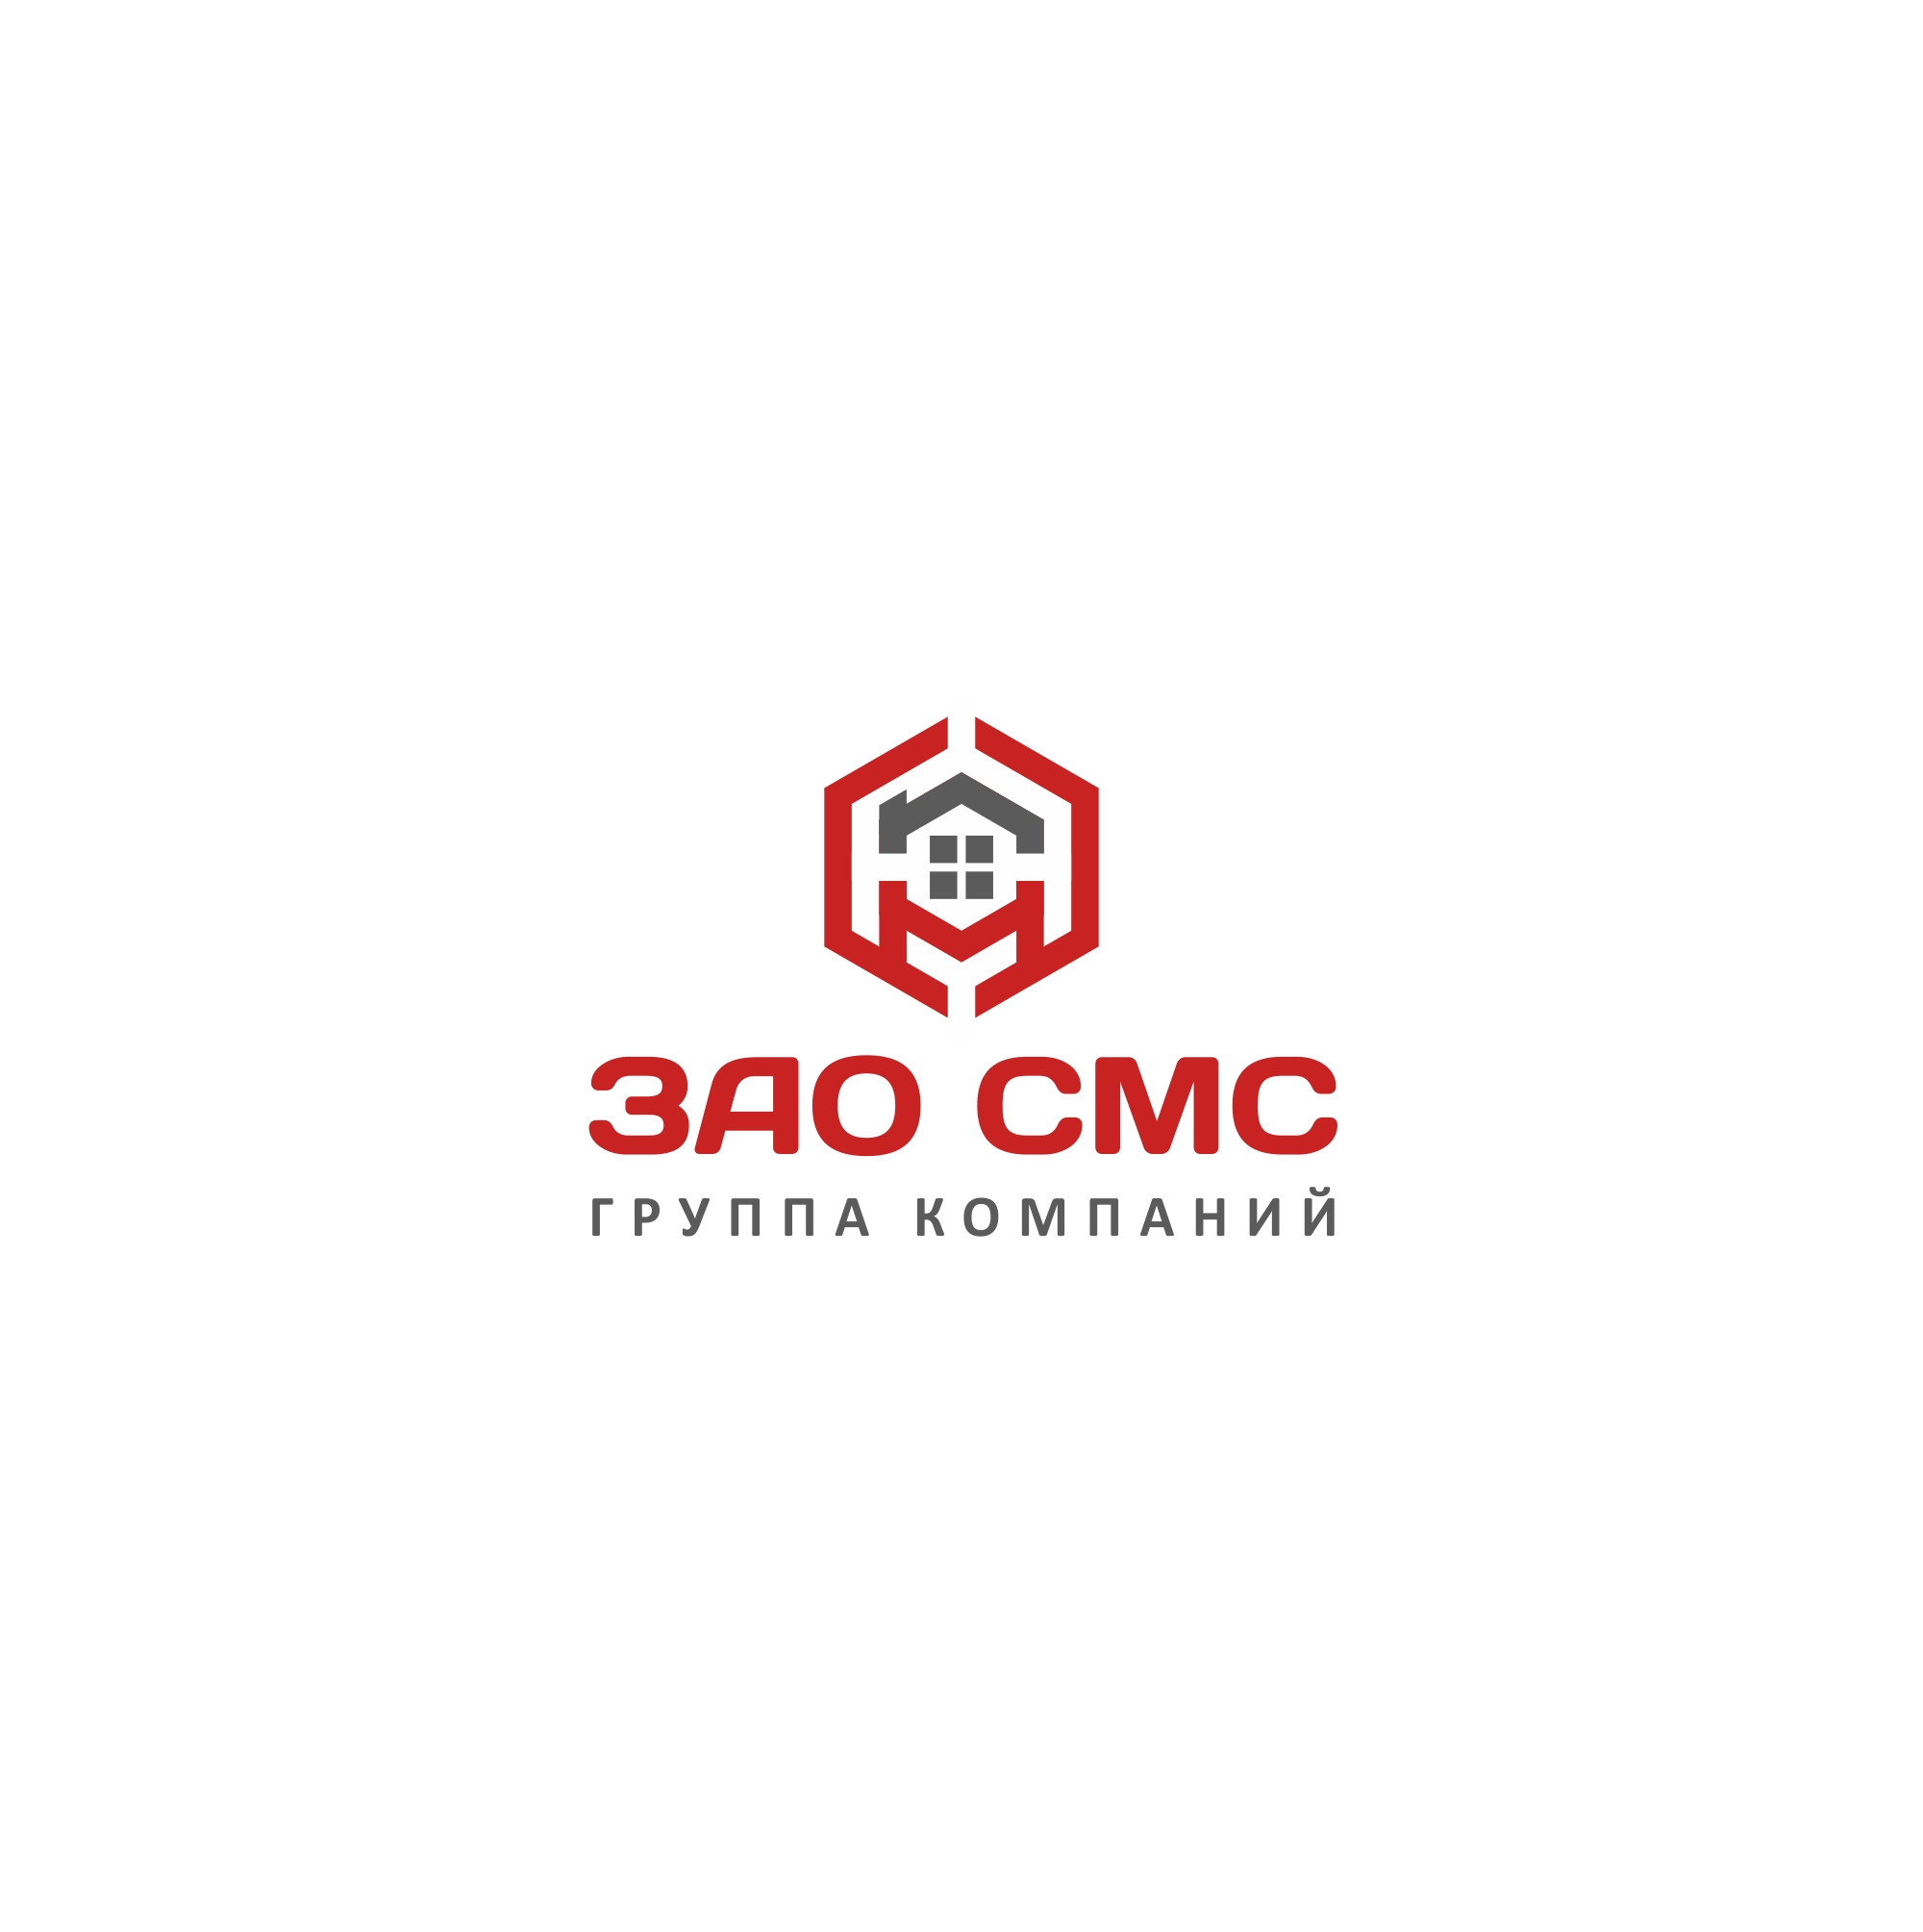 Дизайнер для разработки Логотипа для организации !СРОЧНО! фото f_4365a26ea9728f31.jpg